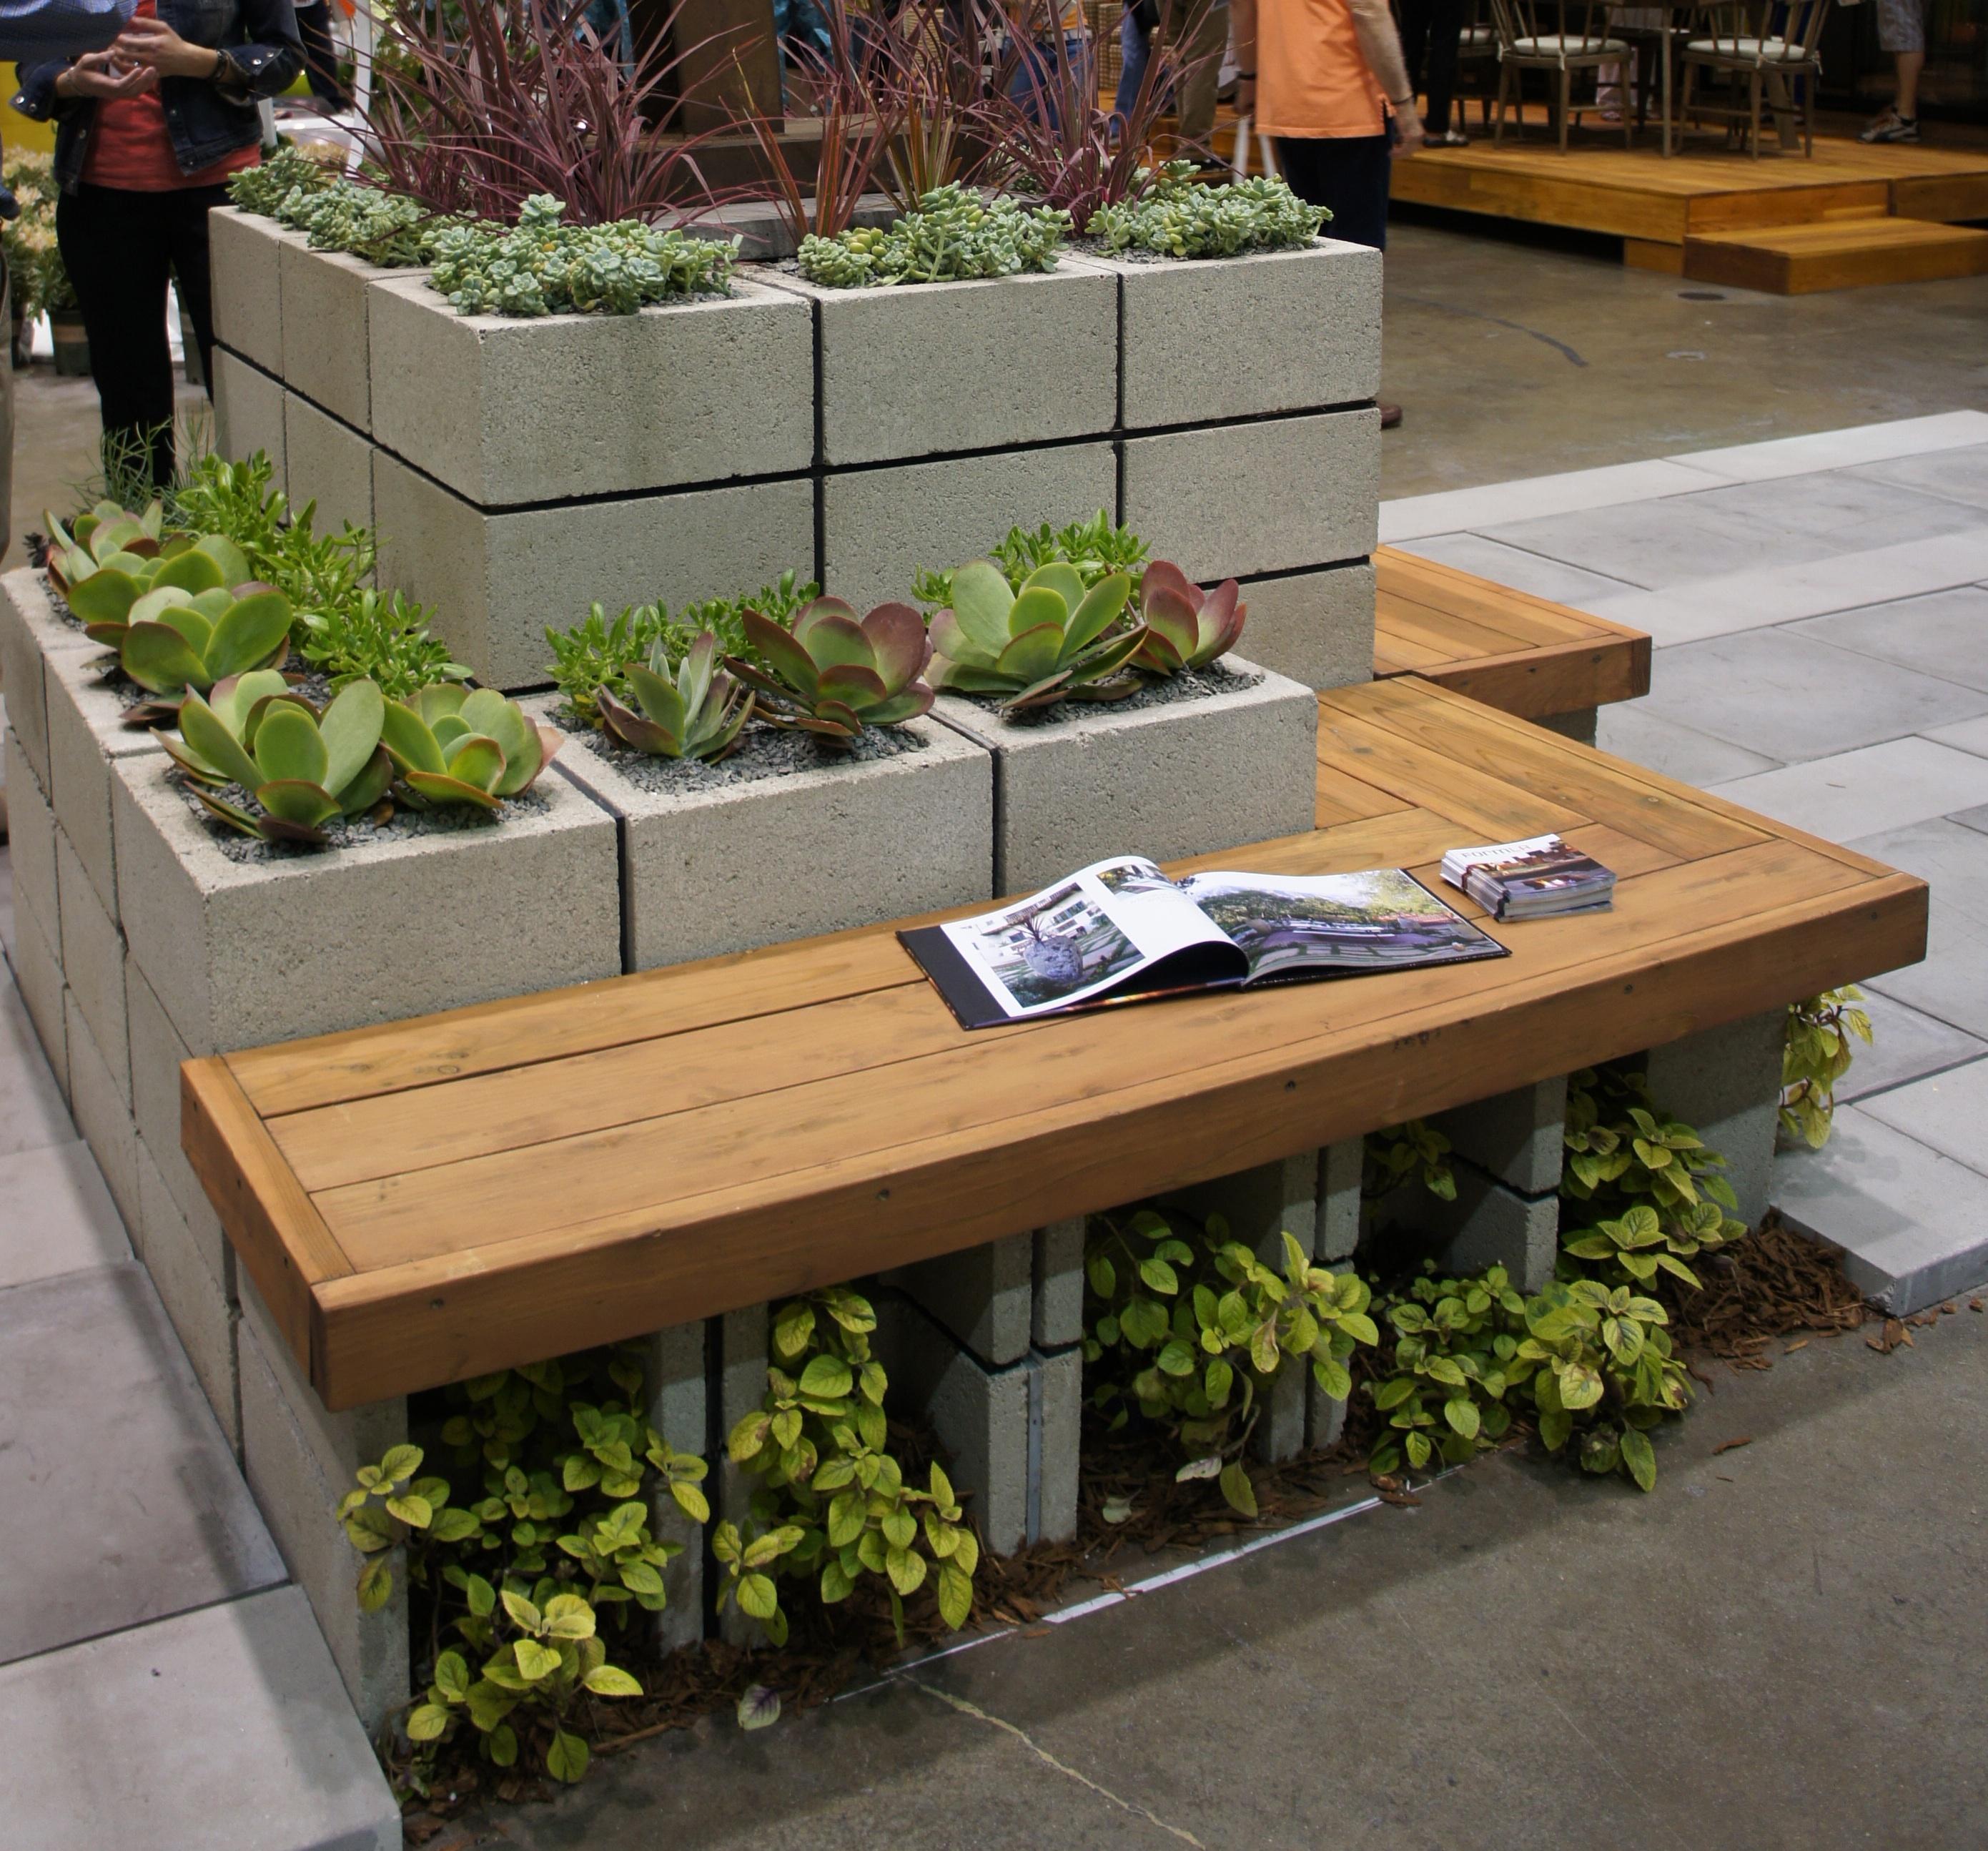 jardim vertical neorex : jardim vertical neorex:Cinder Block Garden Bench